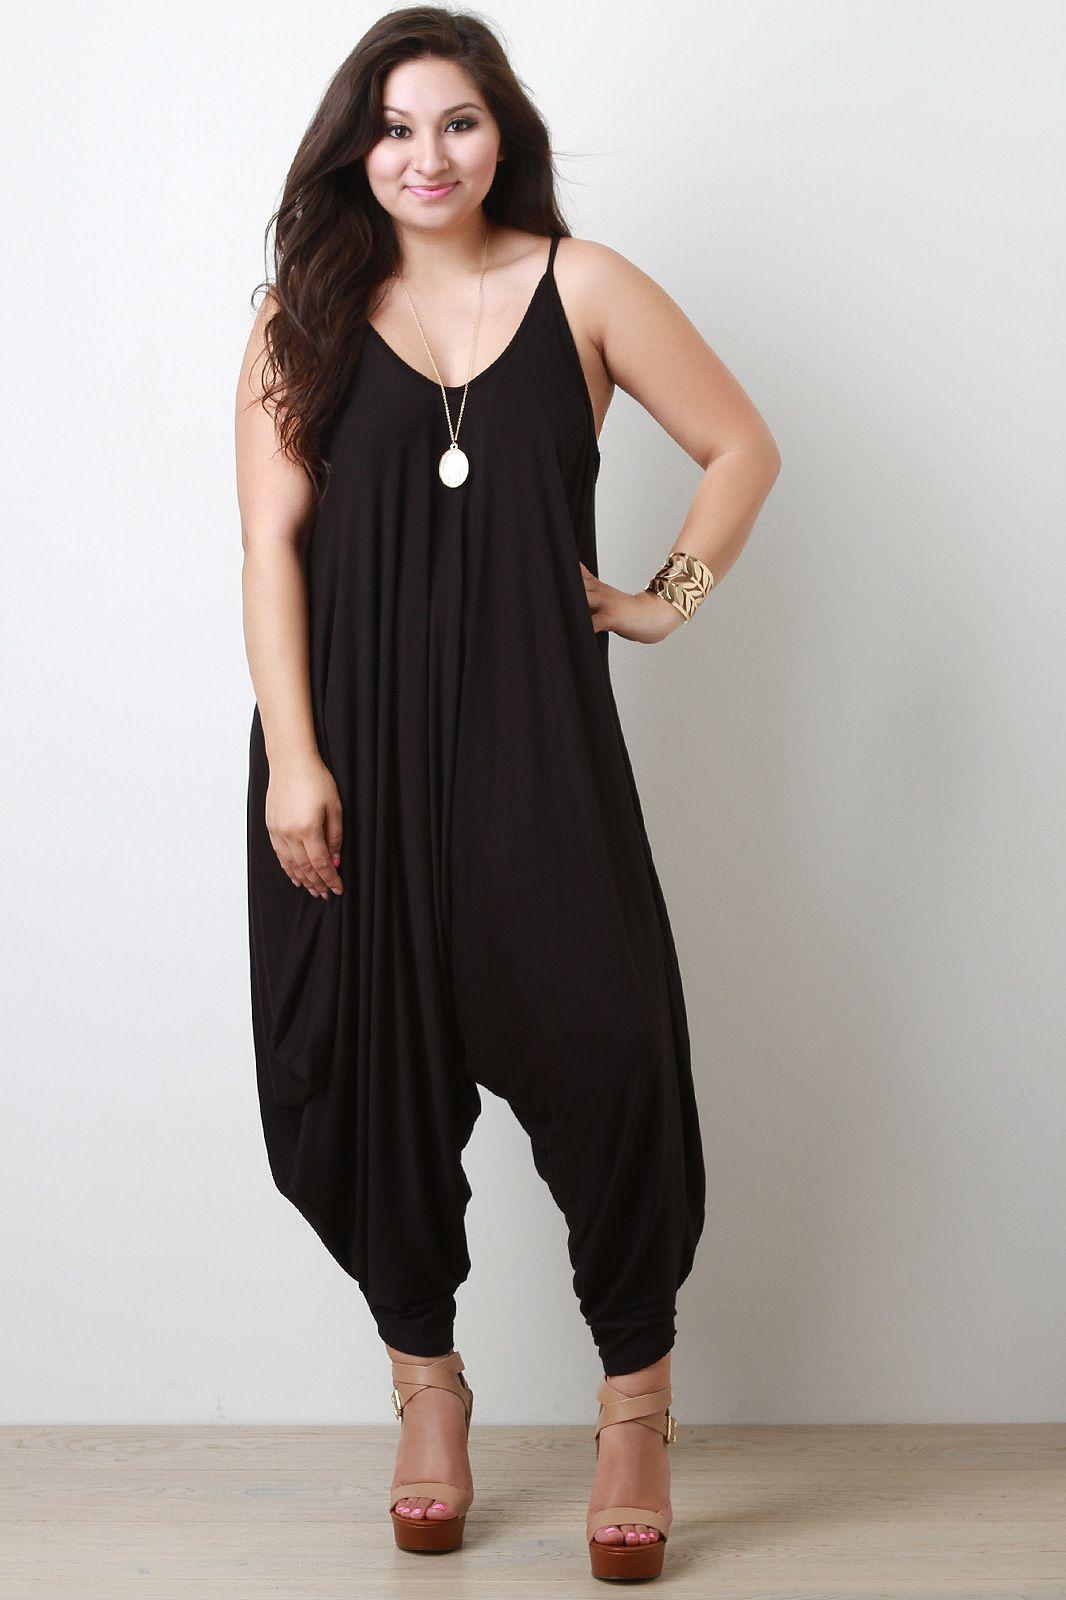 832fcb32754c Black harem pants jumpsuit in plus sizes hammer pants pinterest jpg  1066x1600 Curvy harem jumper dress